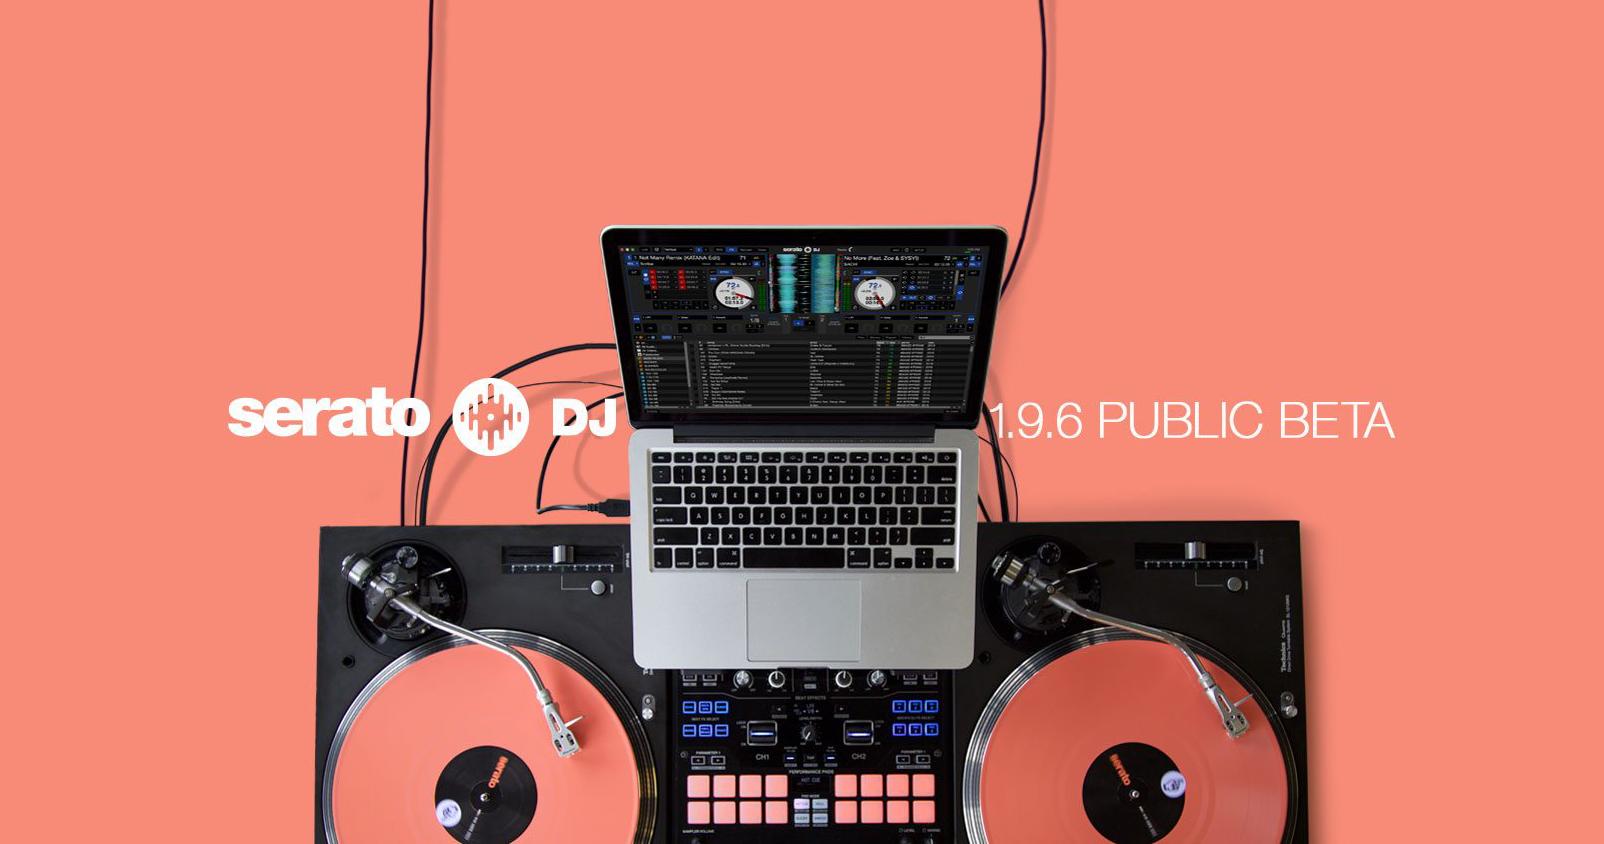 Serato-DJ-1.9.6-1200x630